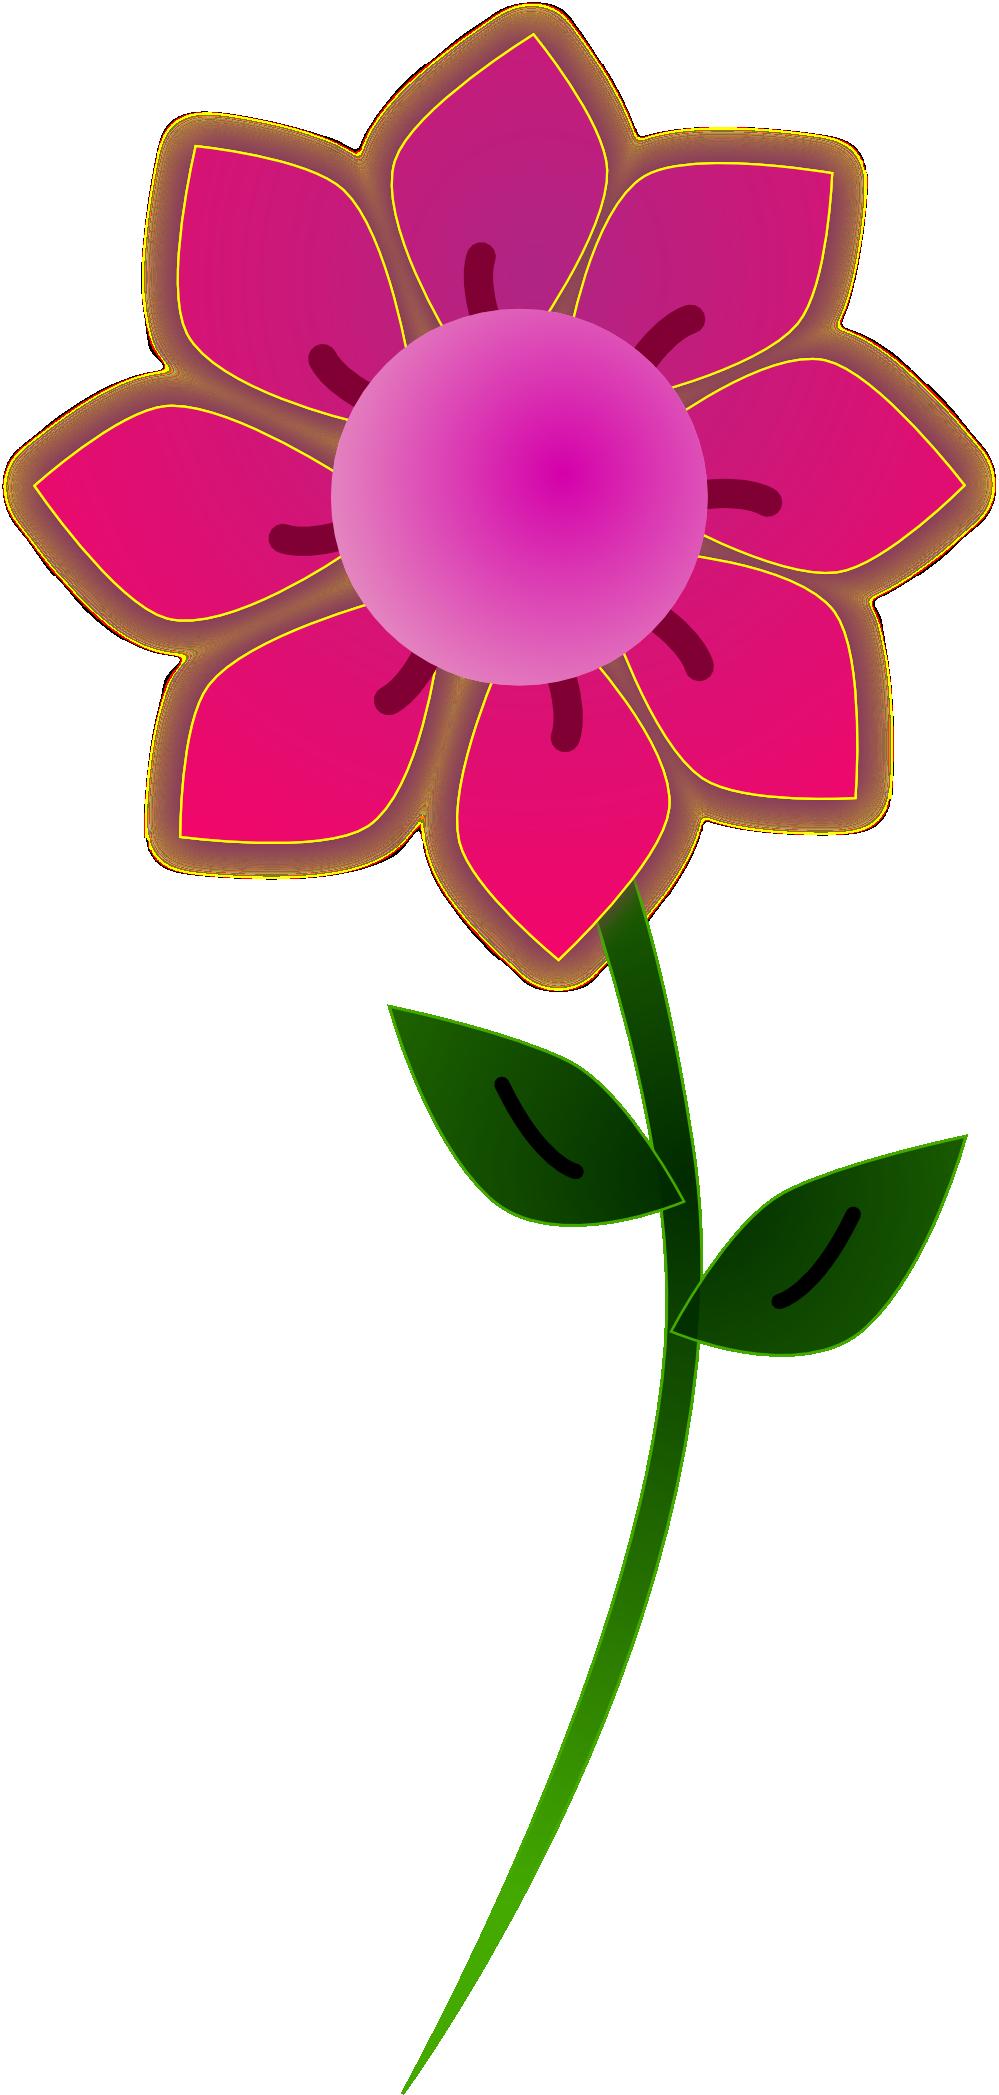 Flowers clipart beautiful. Flower clip art retro